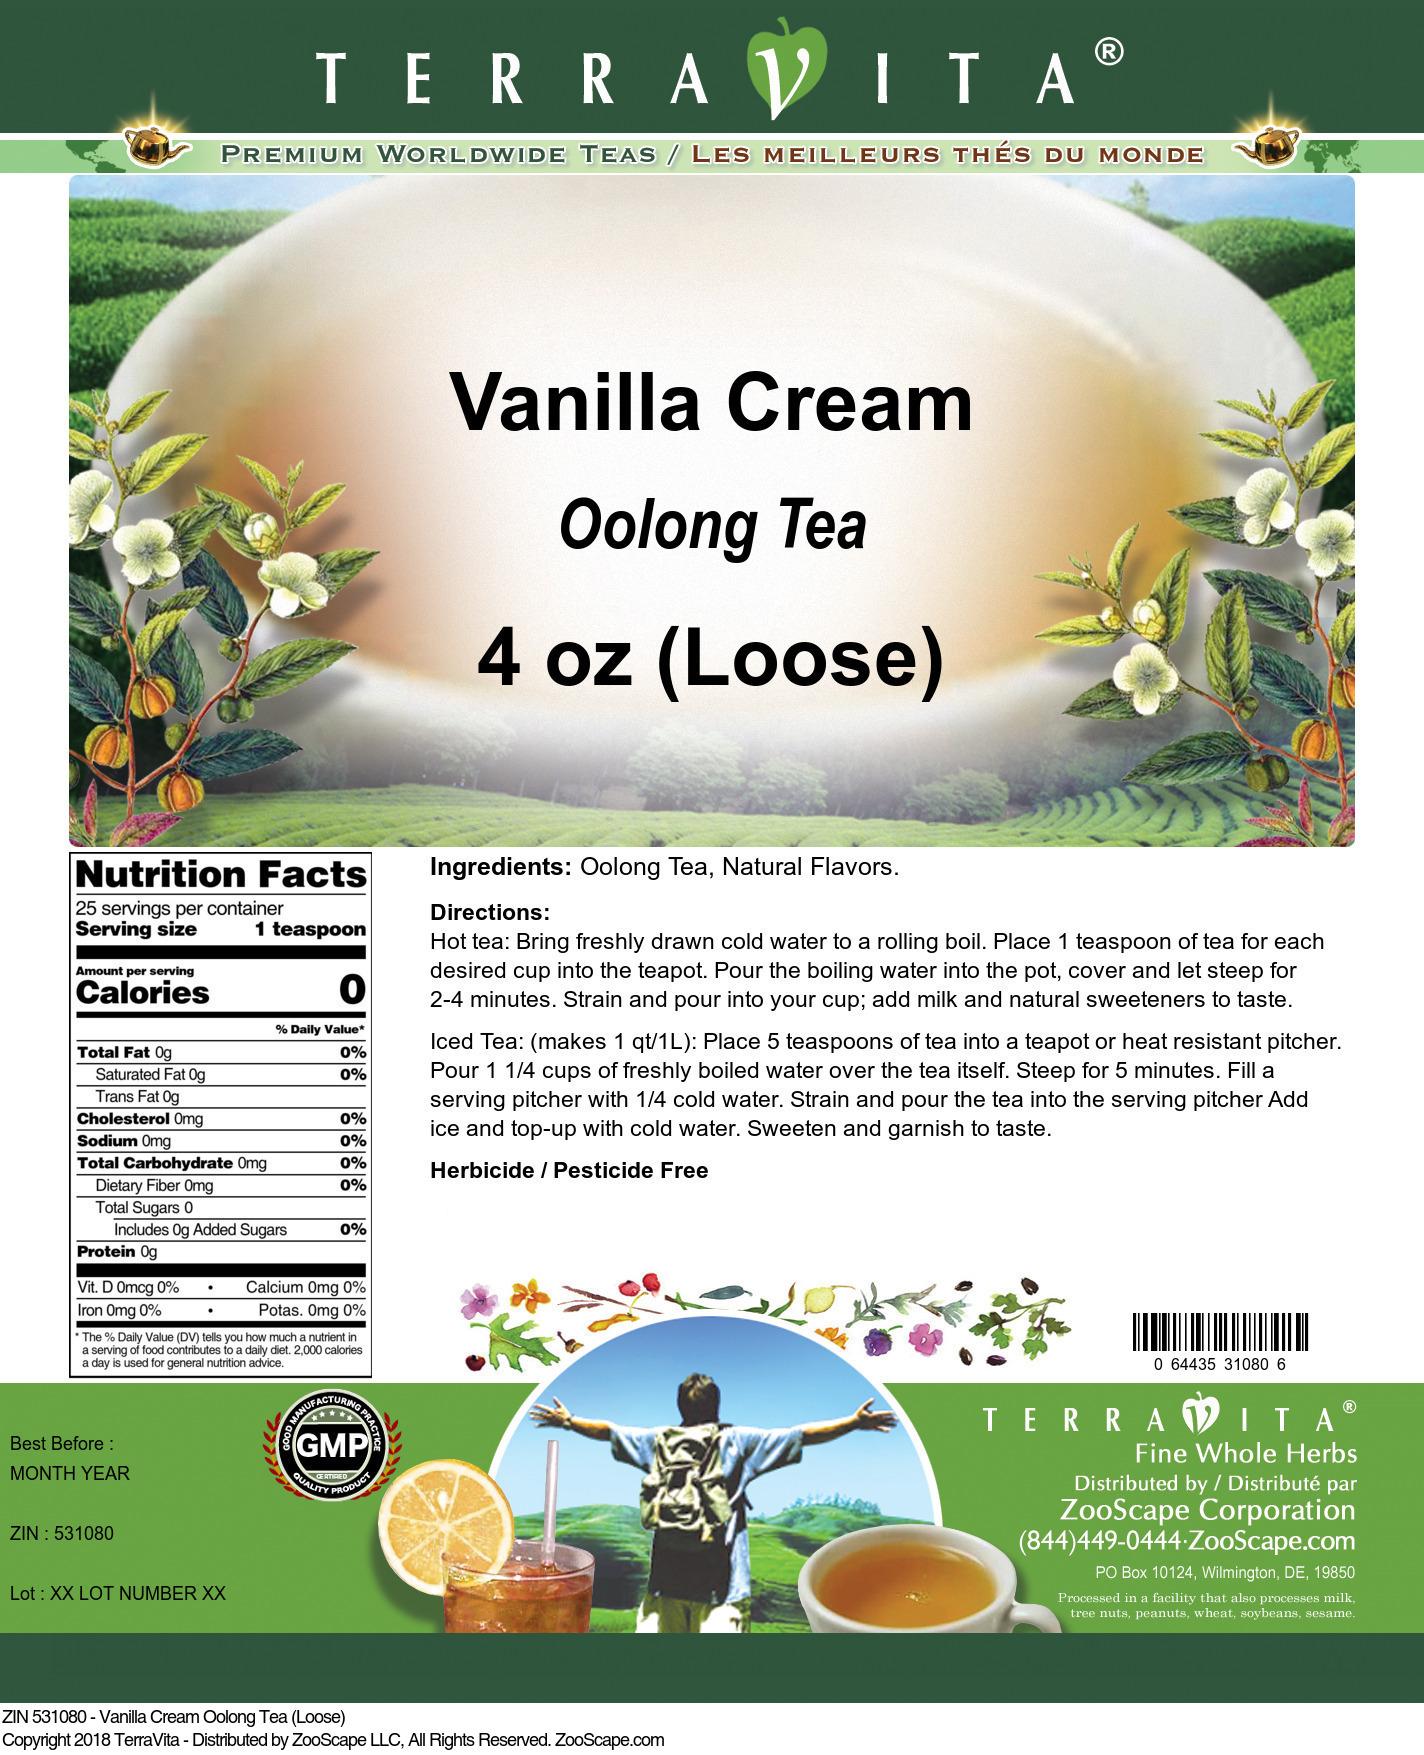 Vanilla Cream Oolong Tea